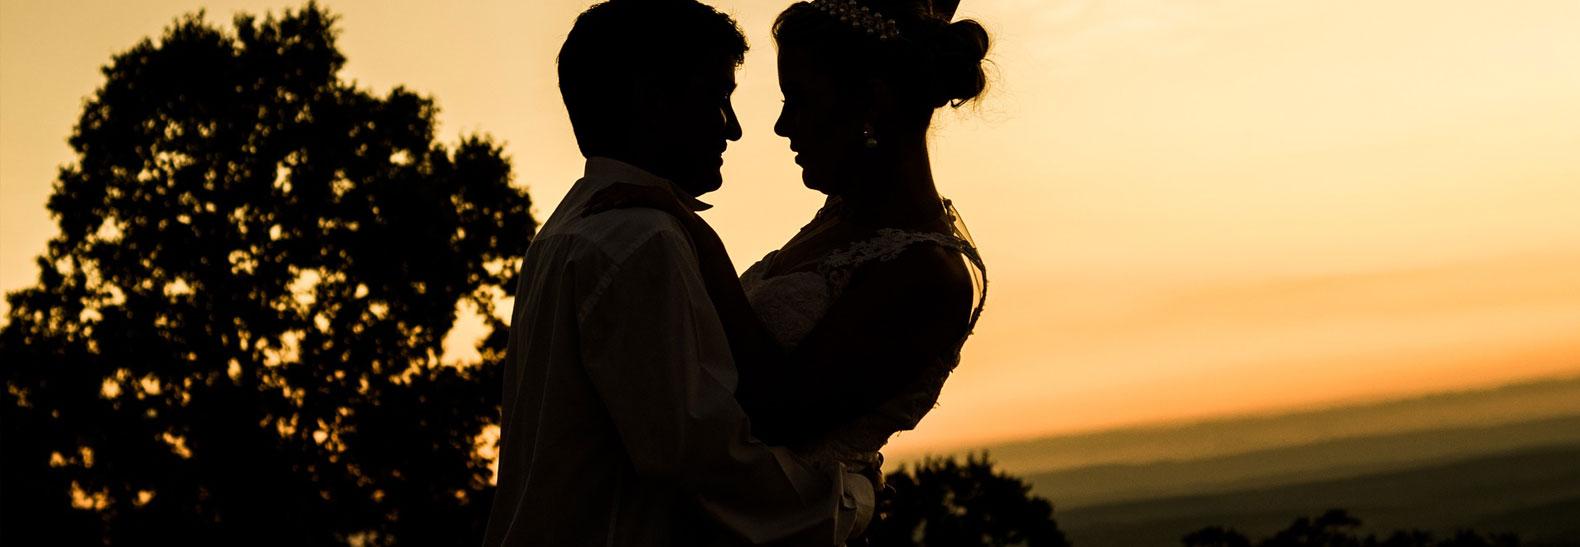 casali matrimonio toscana